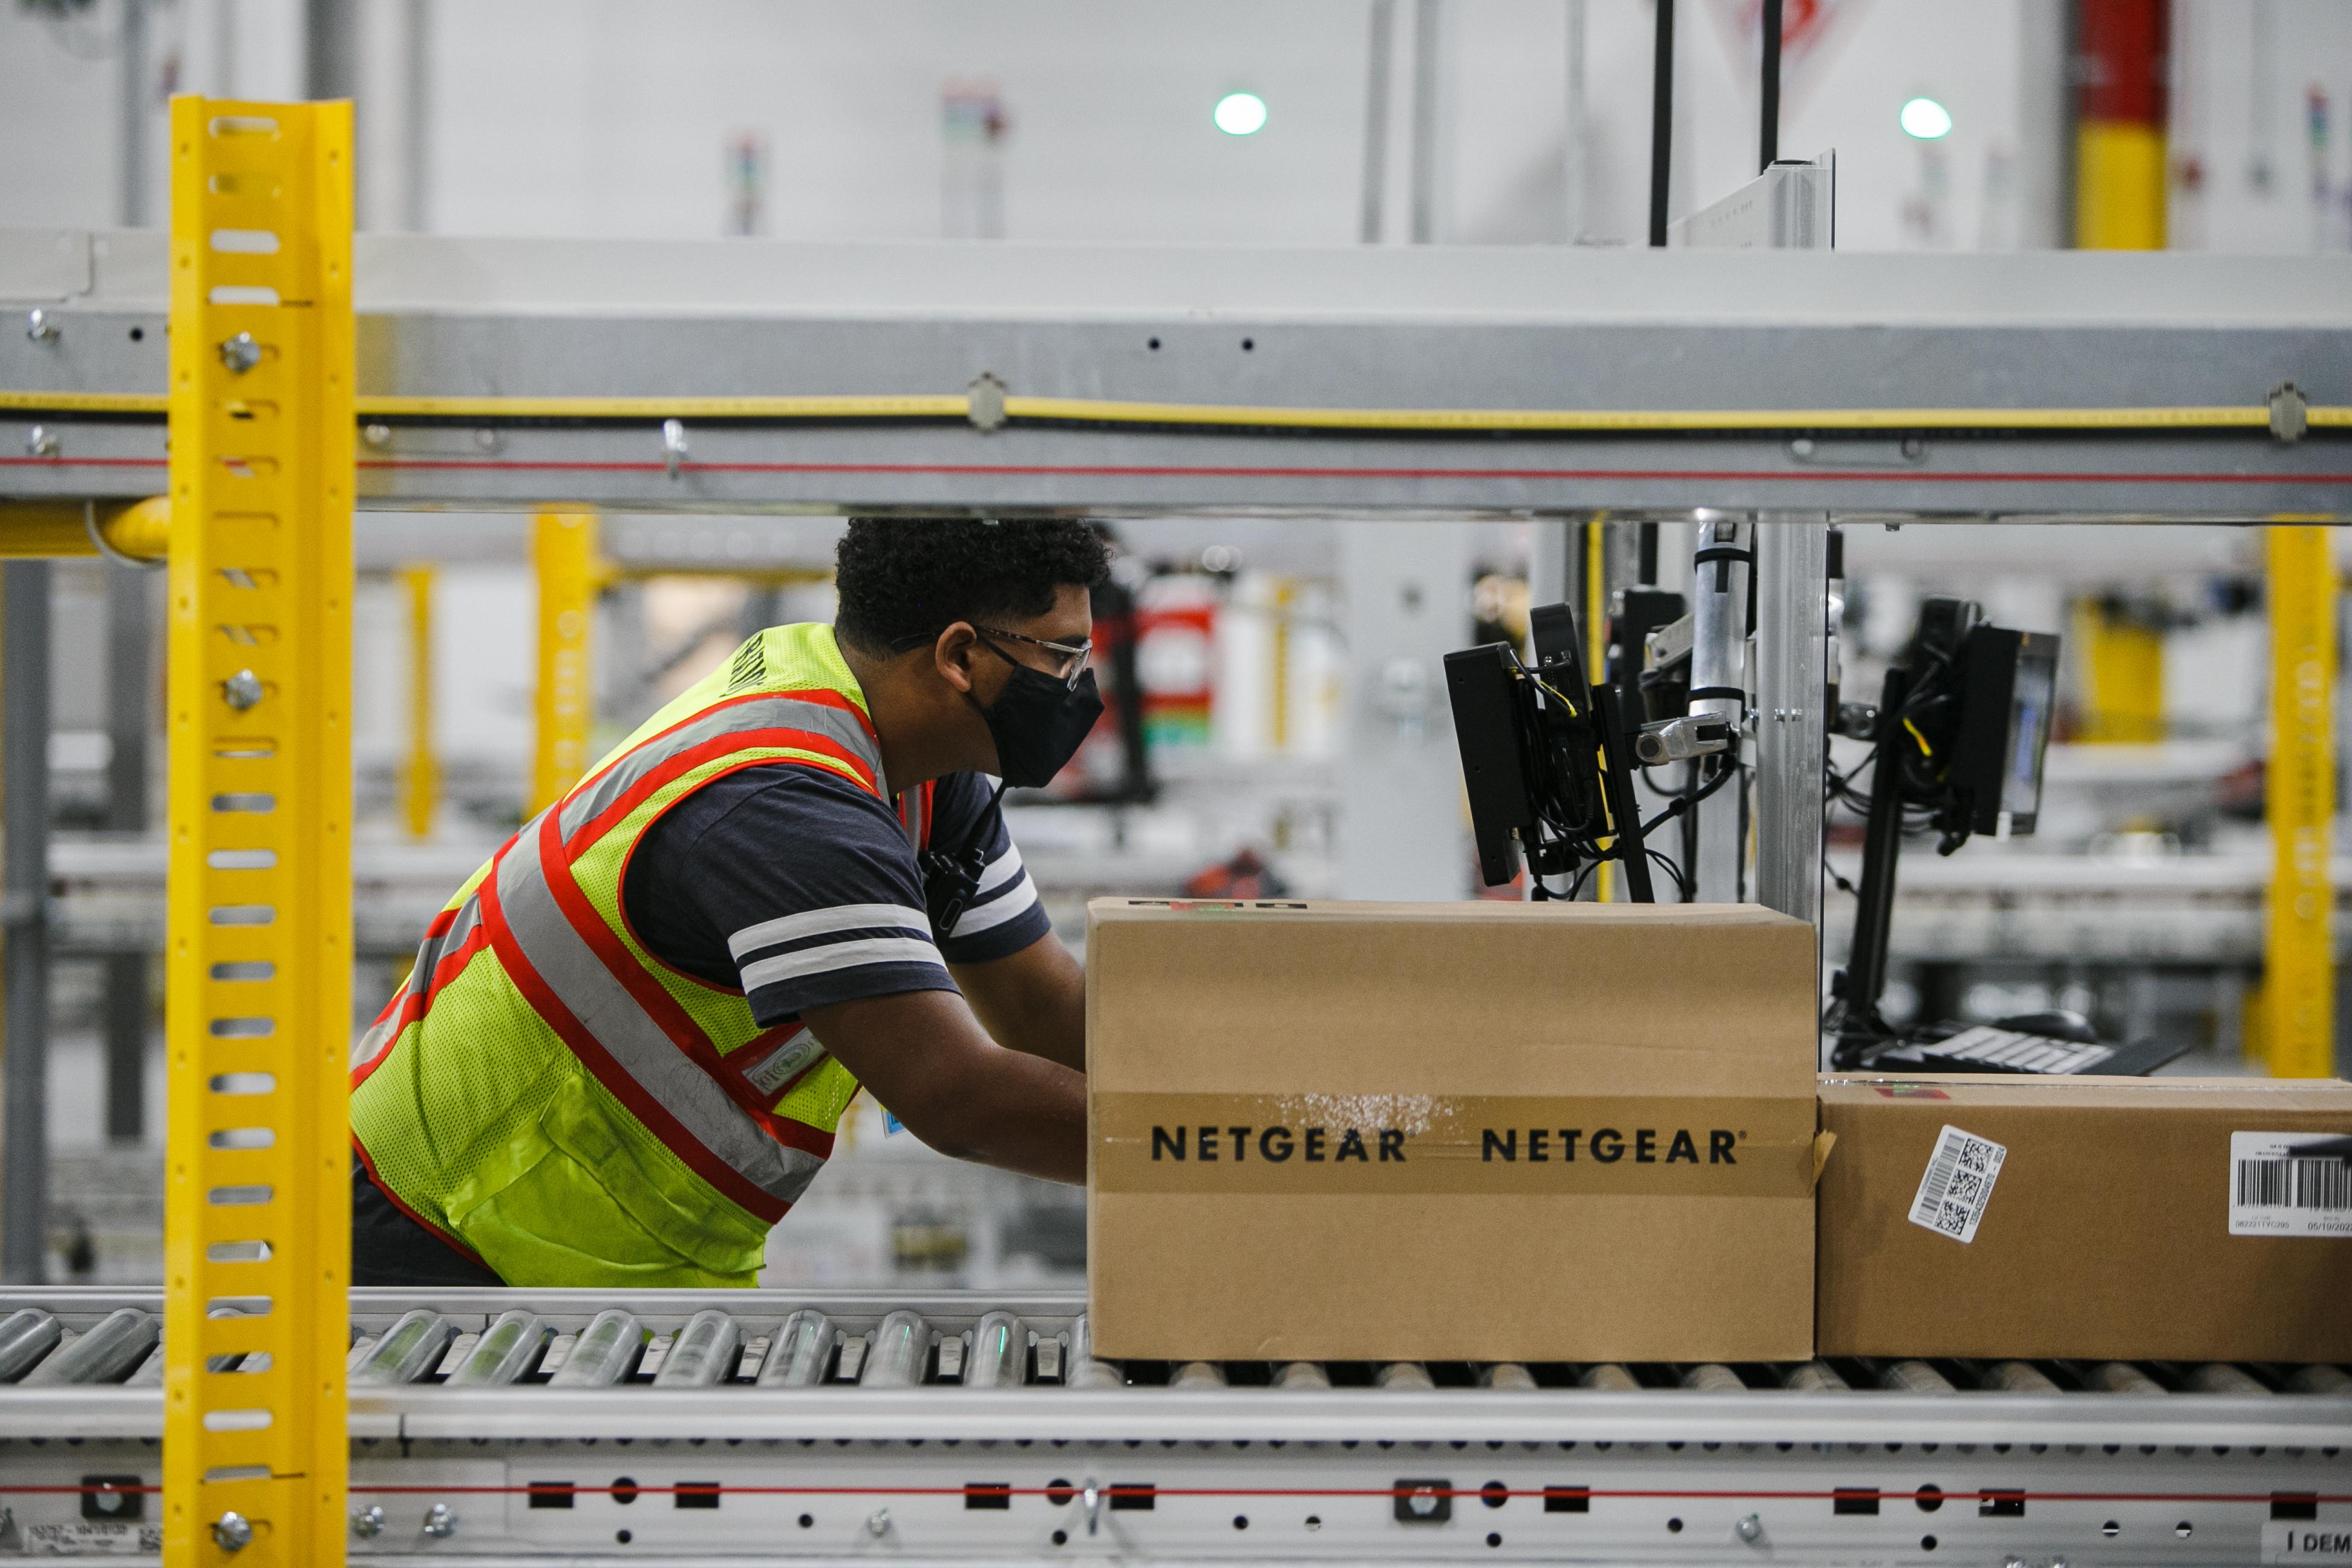 An Amazon employee at the Amazon Fulfillment Center in Matteson Wednesday morning, Oct. 13, 2021. Mark Capapas/Sun-Times